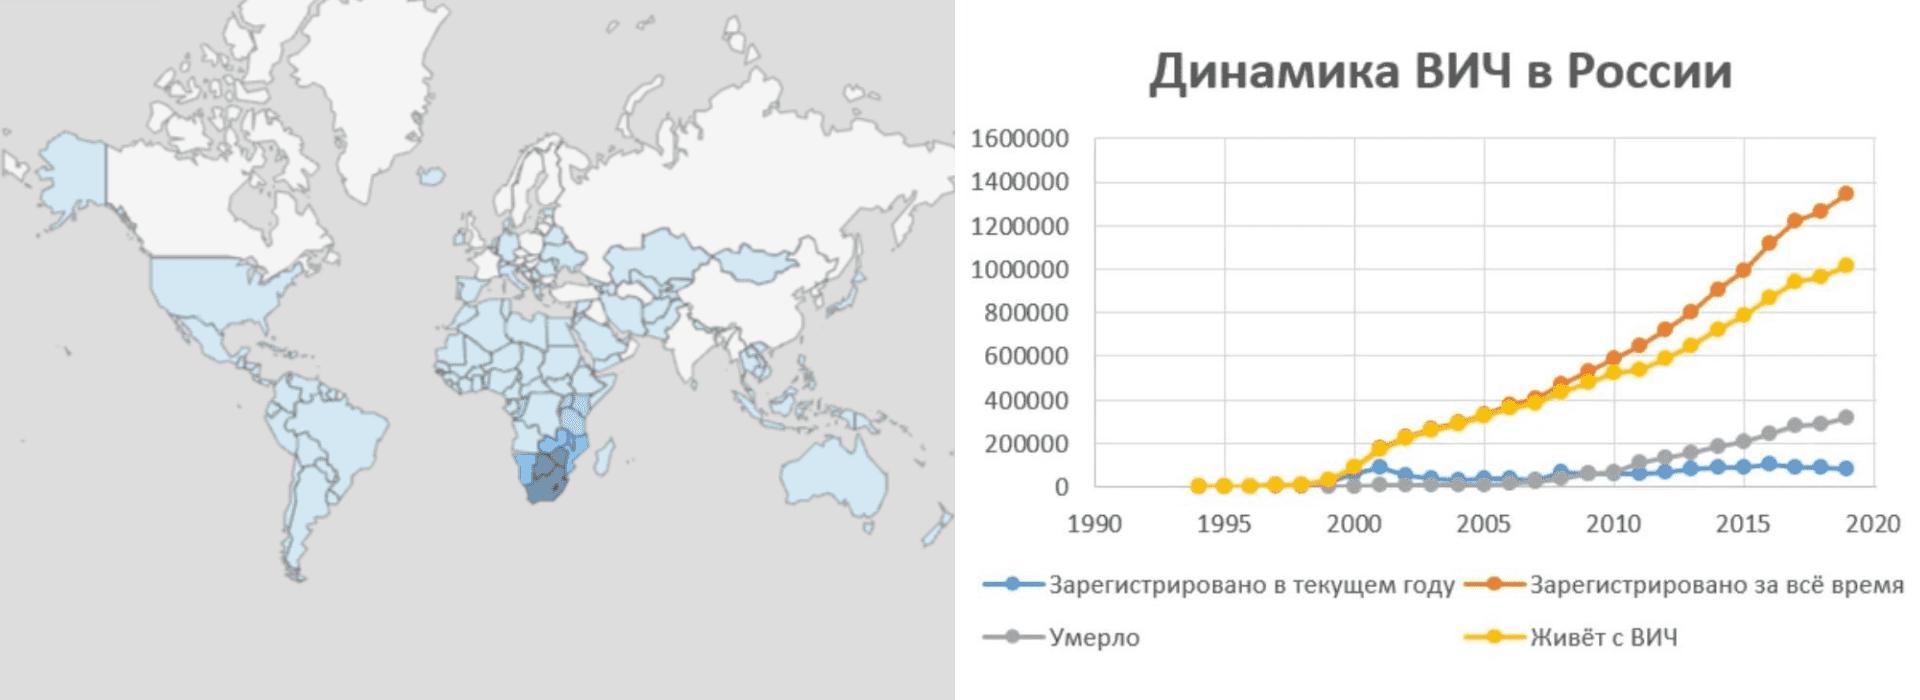 ВИЧ статистика 2020